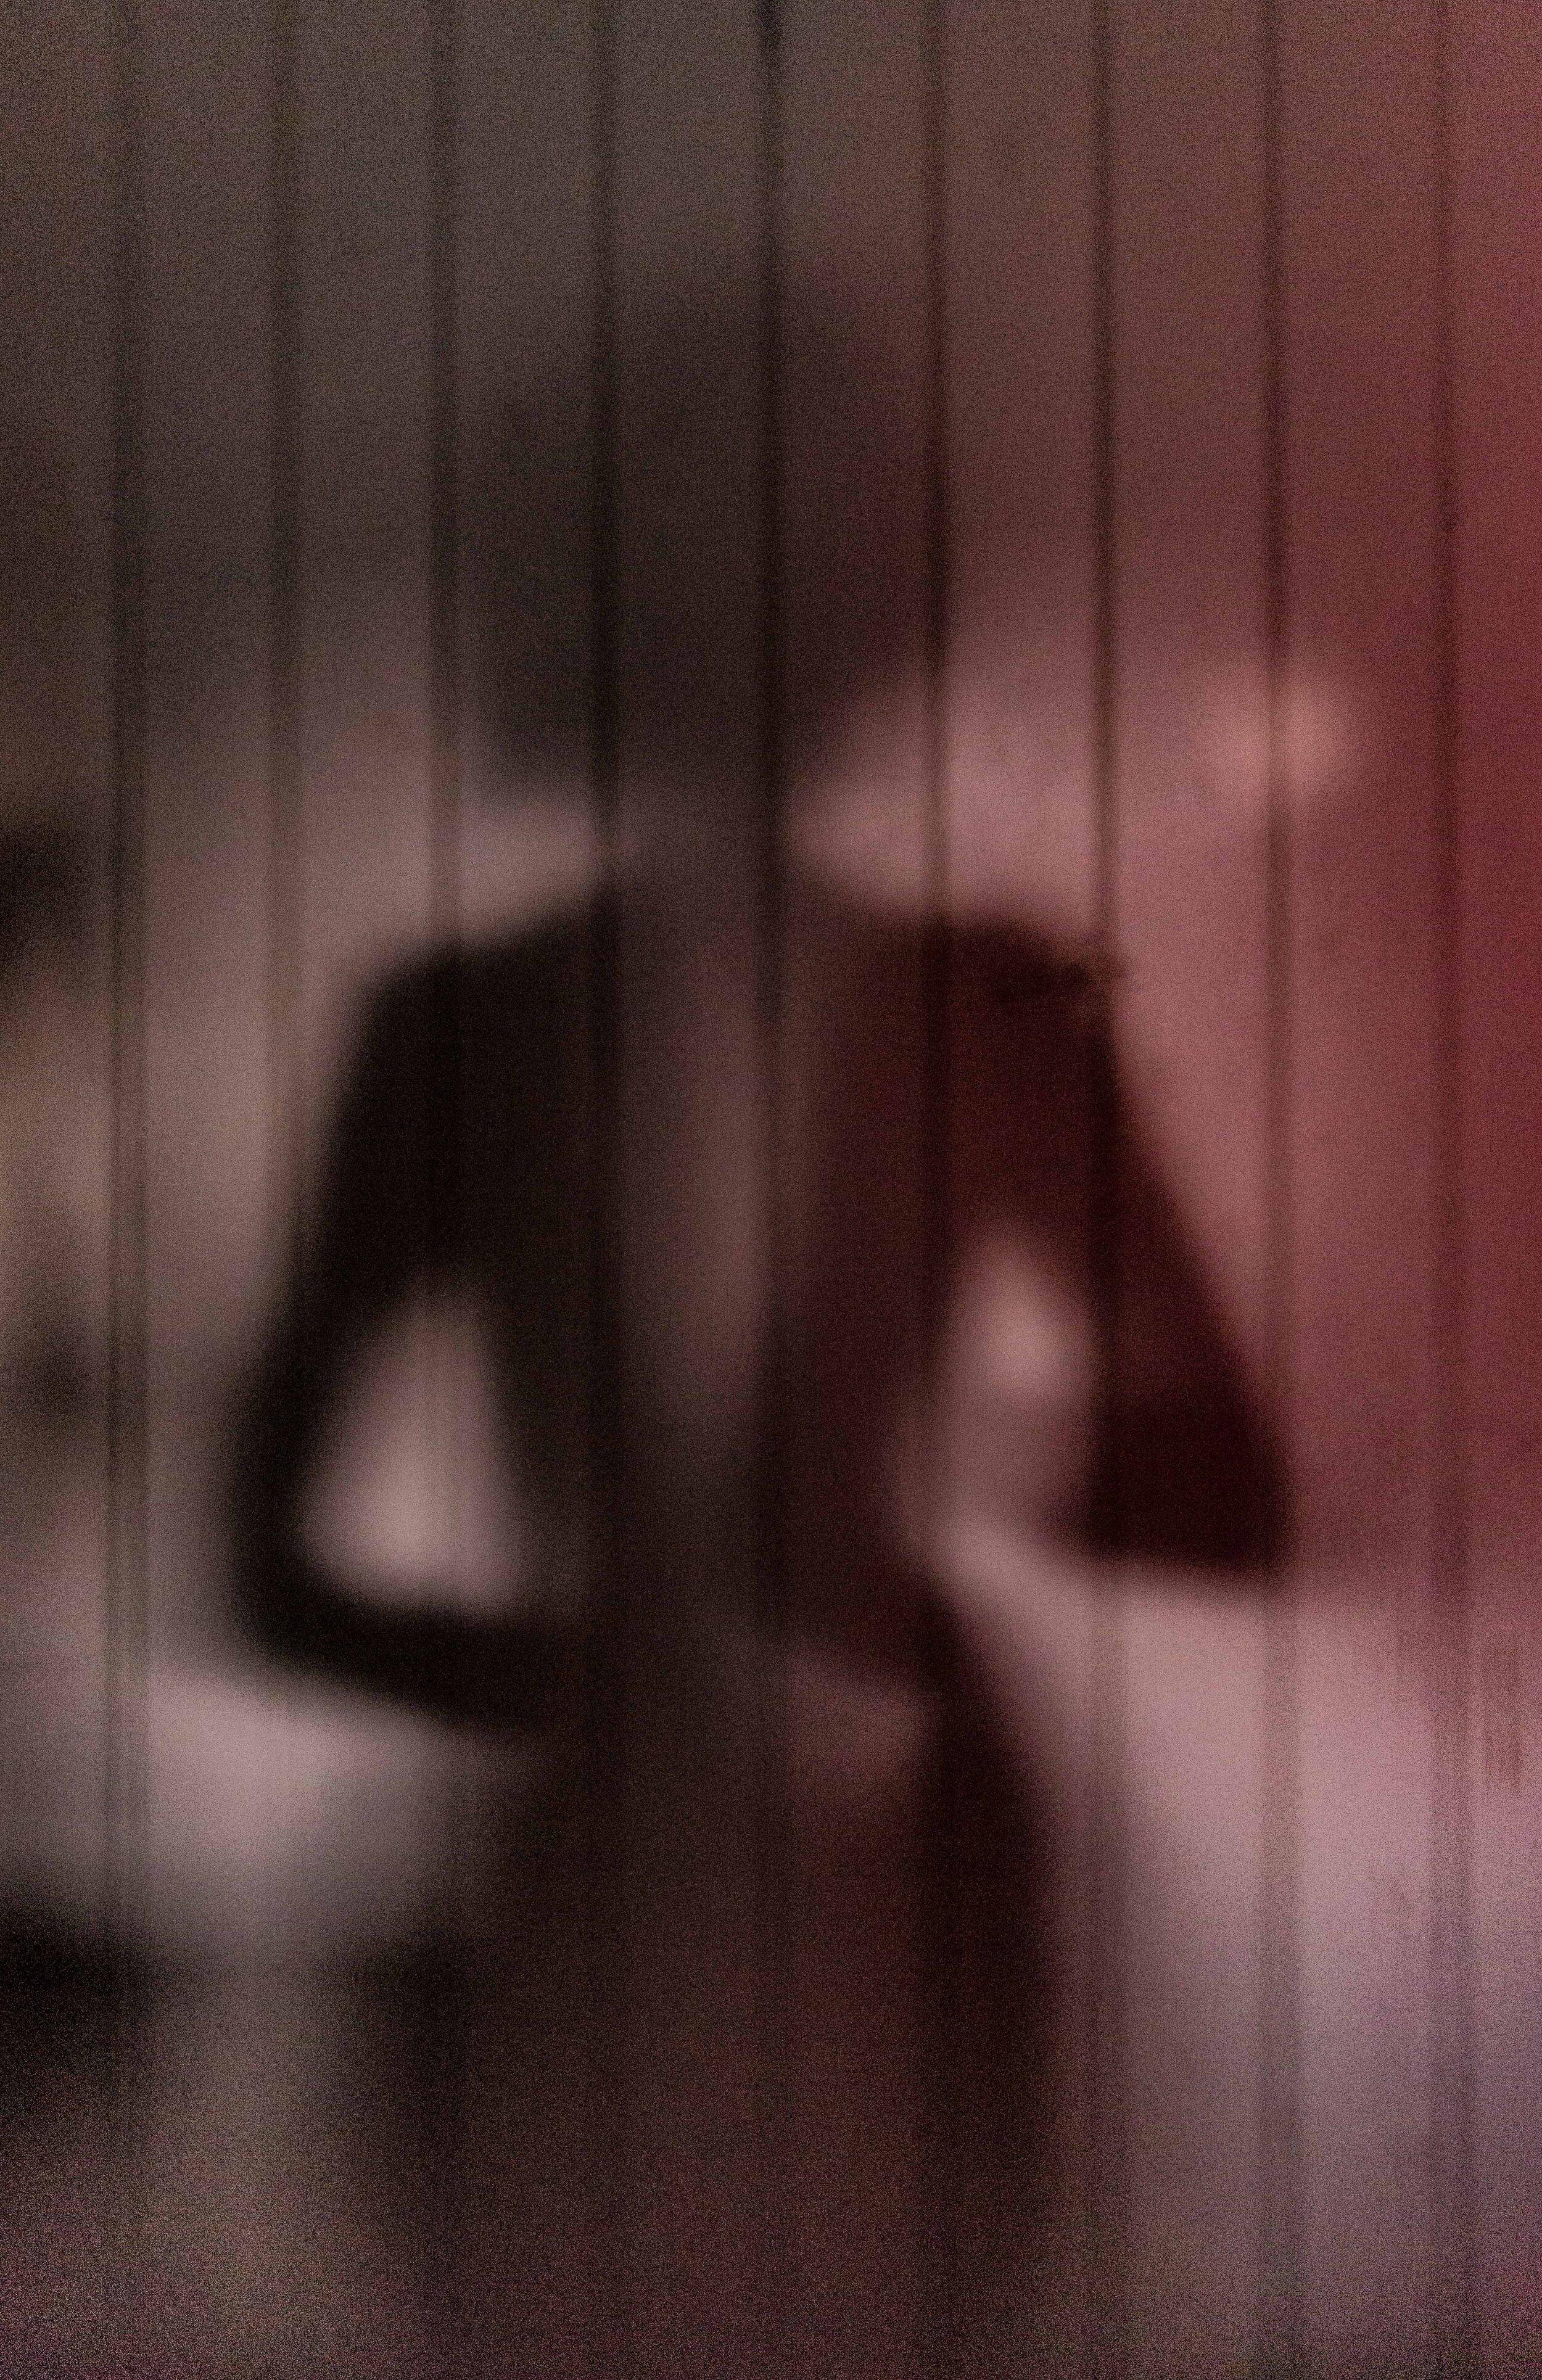 Red shadow self8806© Camilla Jensen 2019.jpg